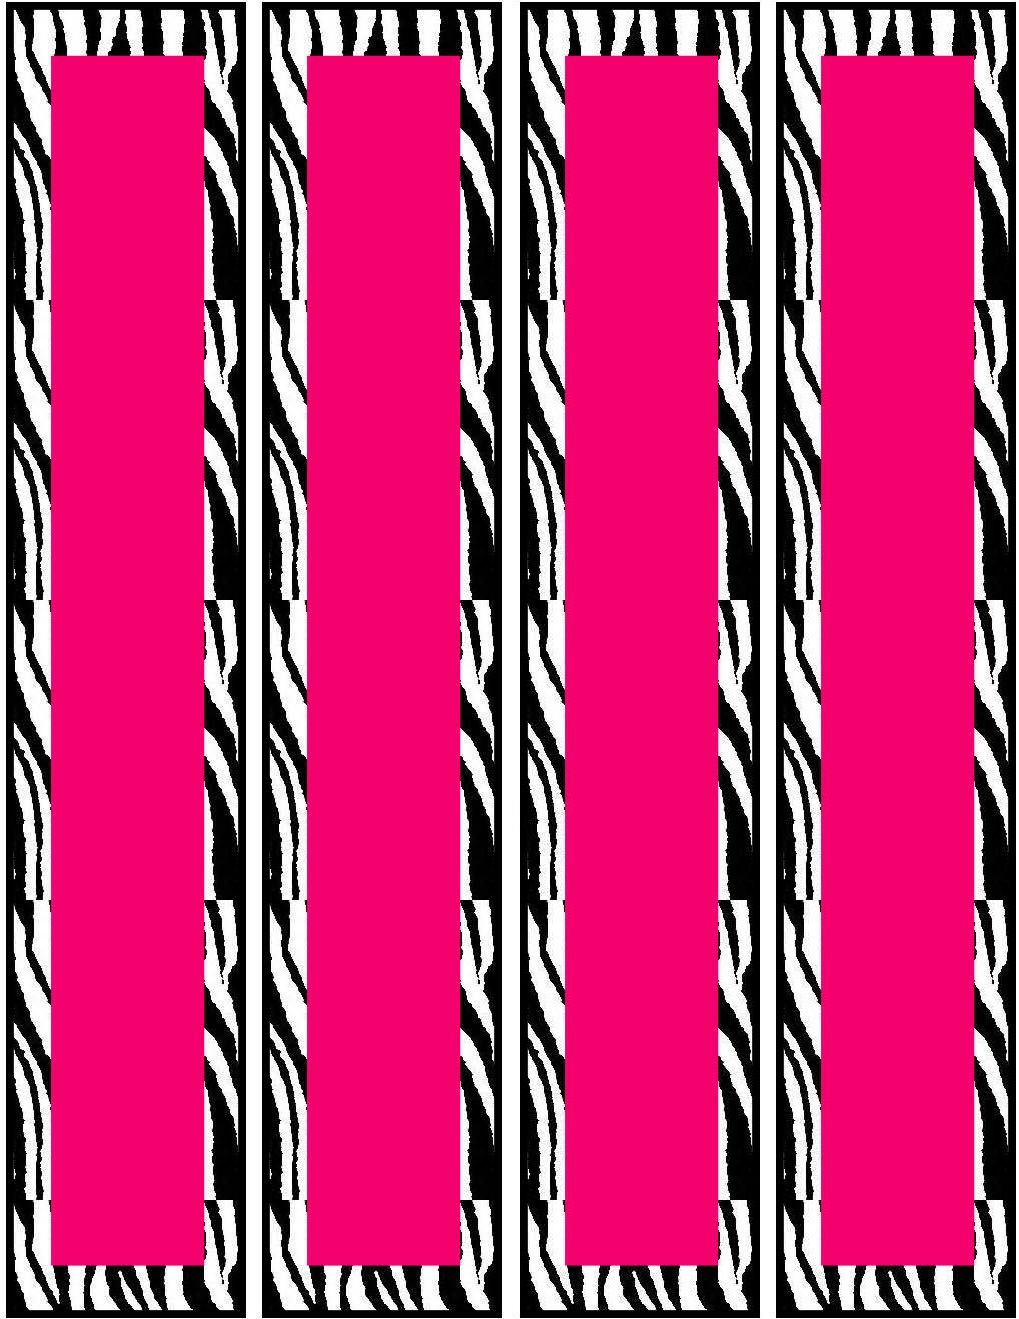 Free Pink Zebra Birthday Party Food Cards Printables Cupcake Toppers Zebra Birthday Party Zebra Party Zebra Birthday